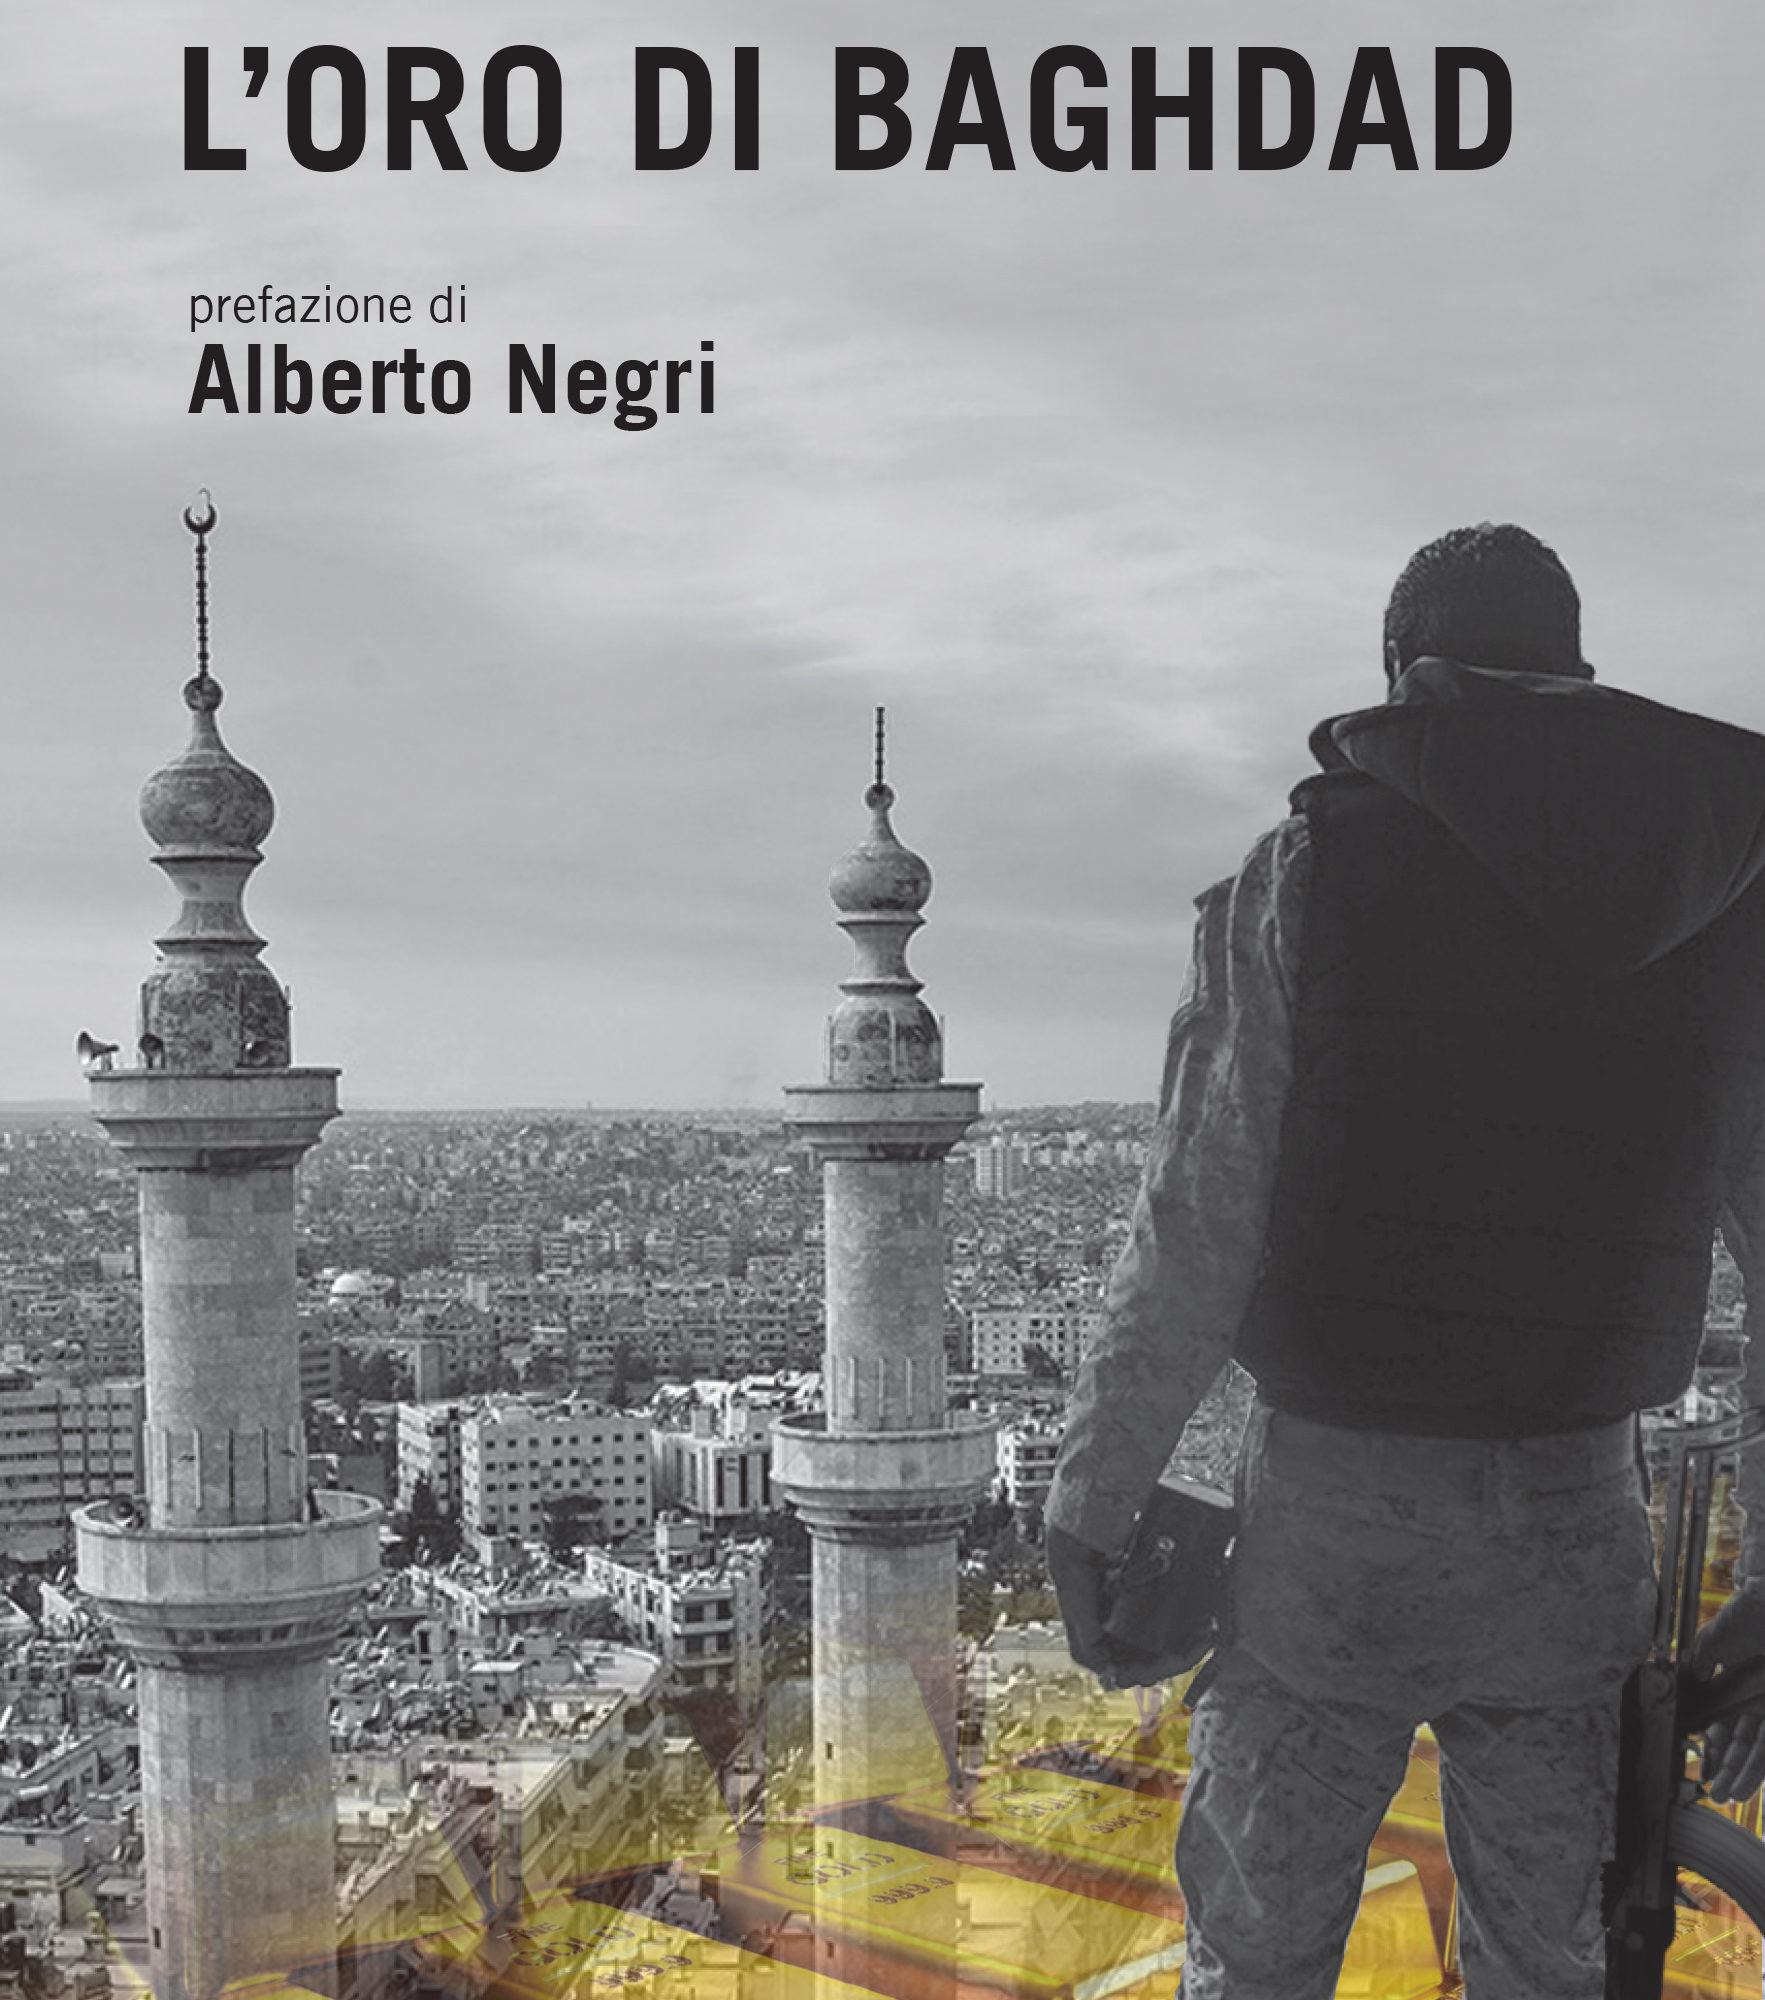 Marco Forneris – L'oro di Baghdad